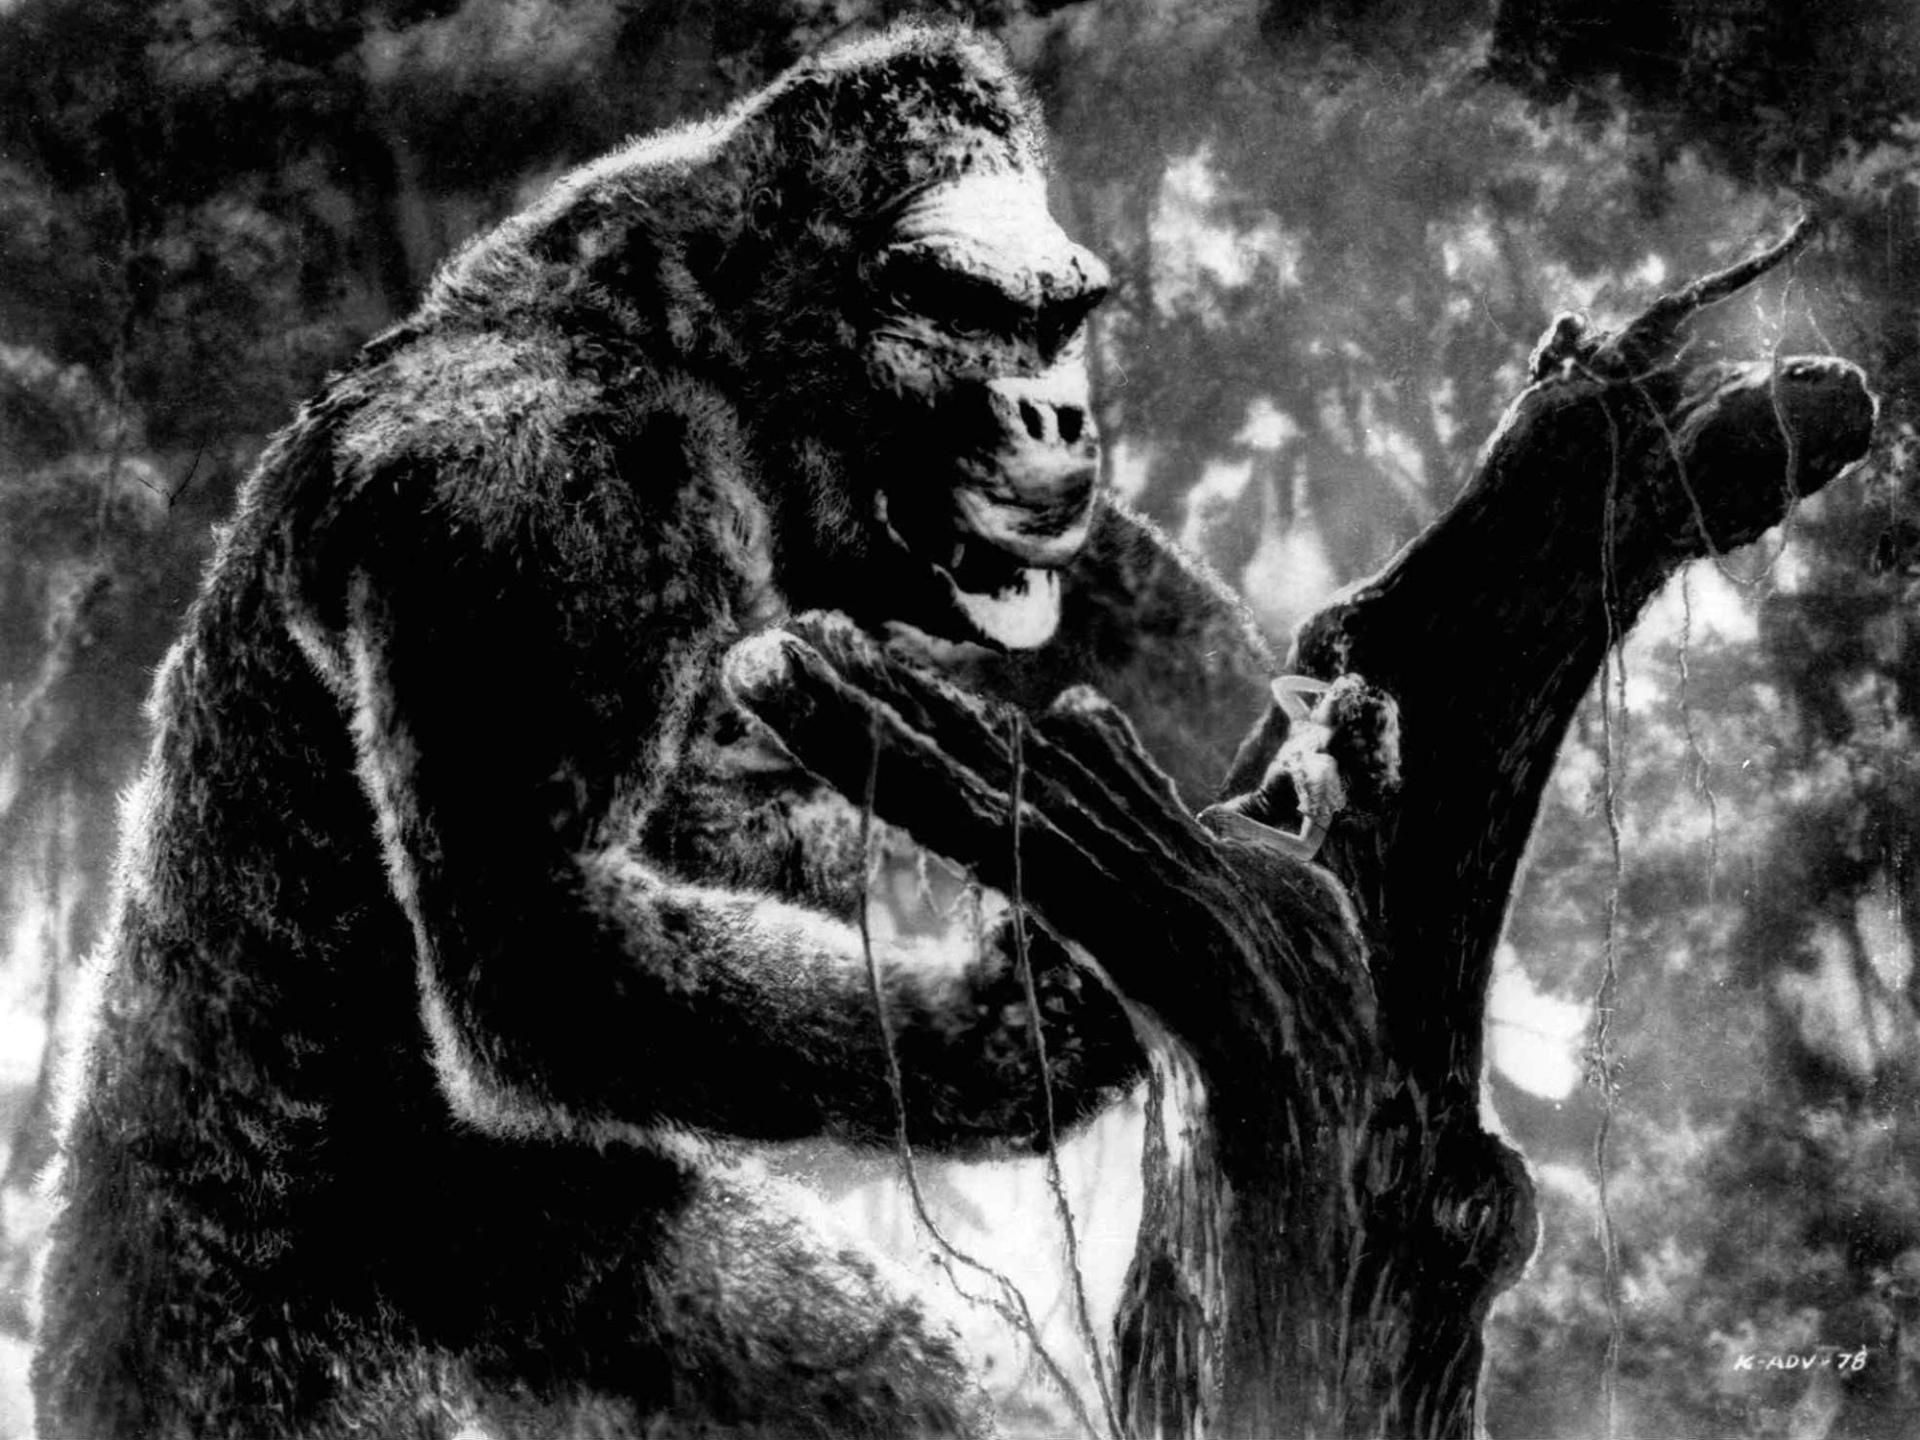 King Kong (1933) wallpapers HD quality